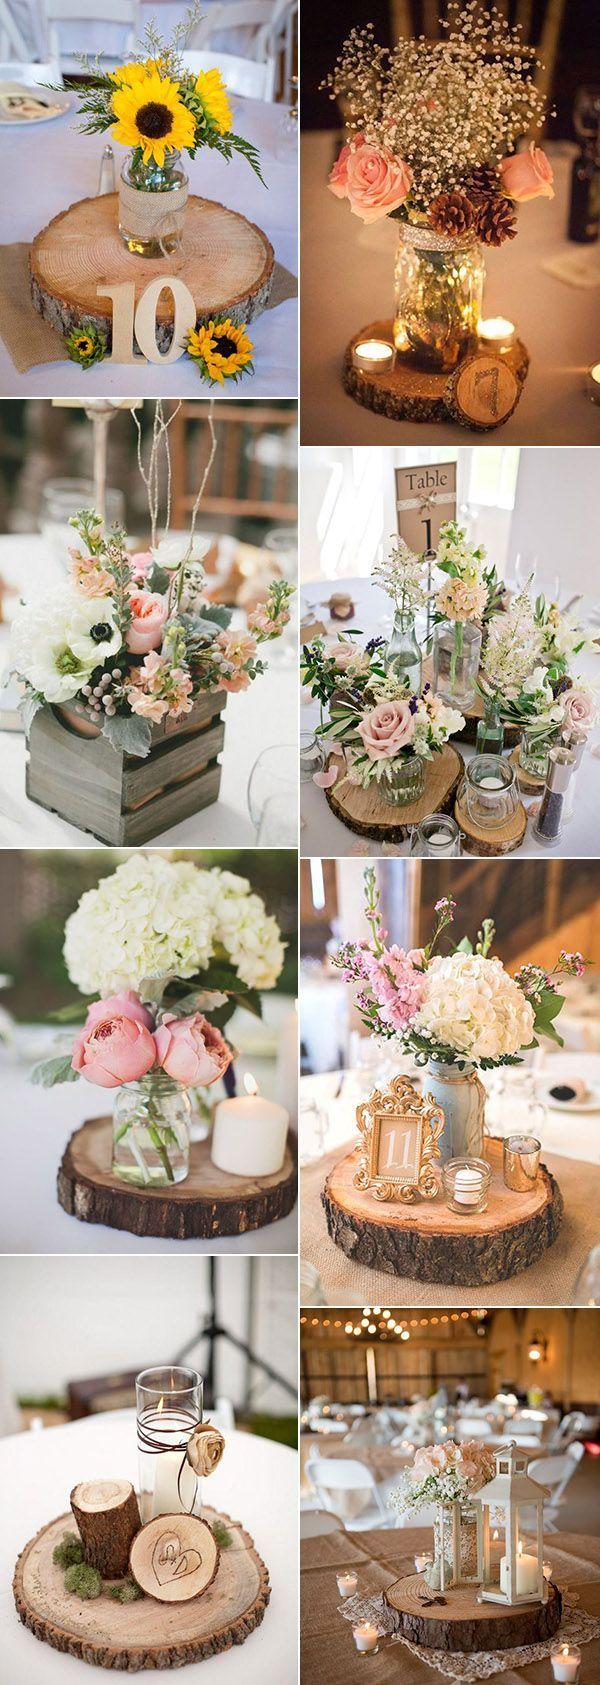 2019 Wedding Trends 36 Perfect Rustic Wood Themed Wedding Ideas Svatba